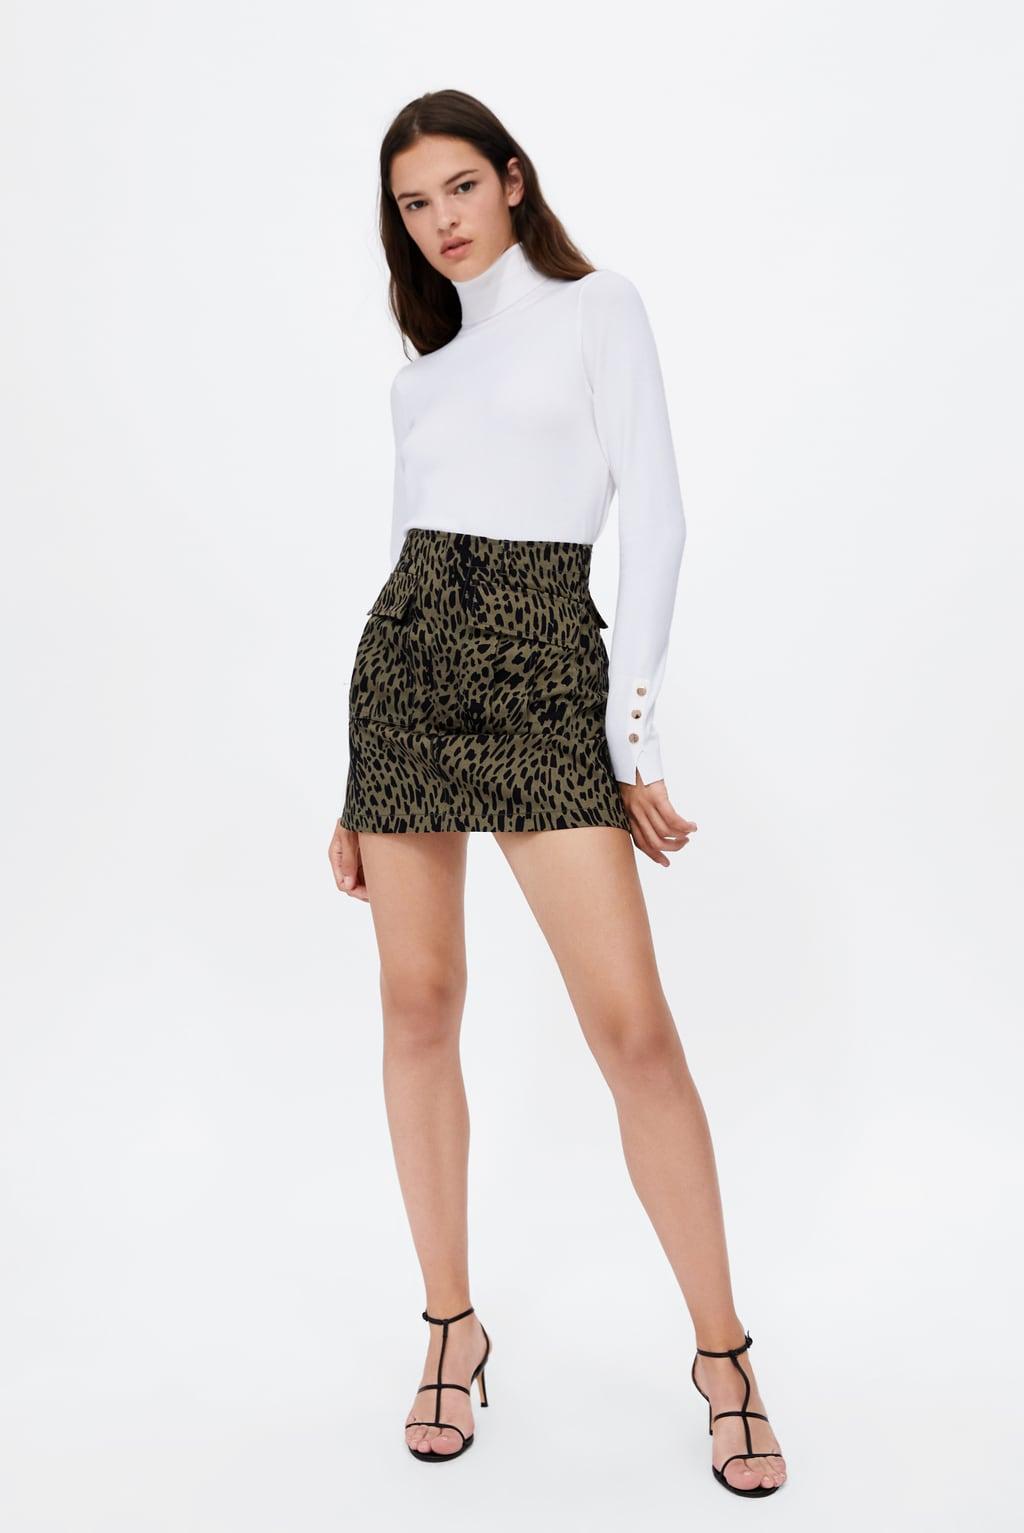 Basic Coltrui  Basics Tricot Dames by Zara